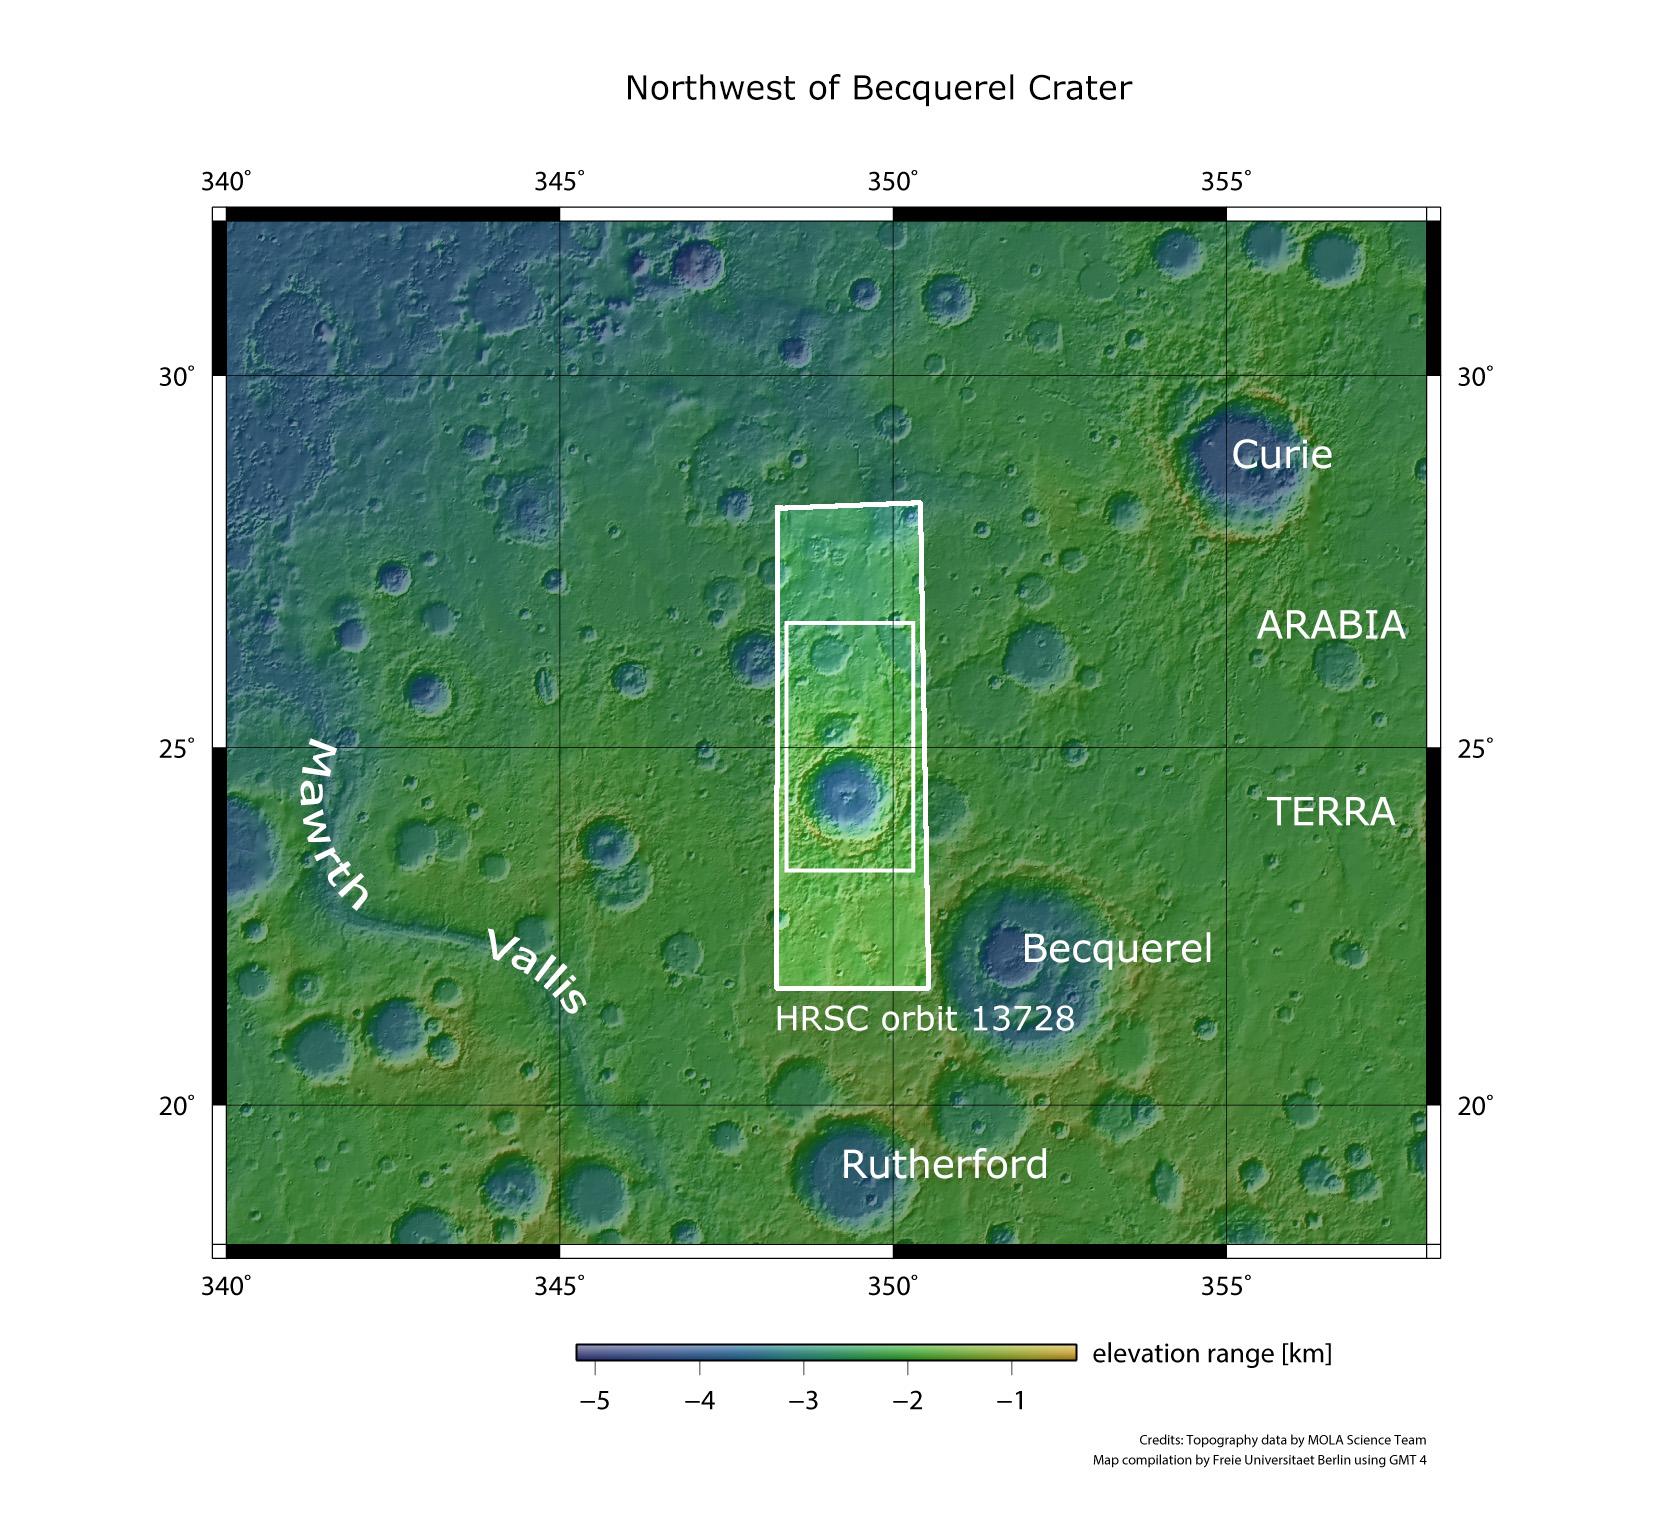 Crater_Generations-ArabiaTerra_ctxt